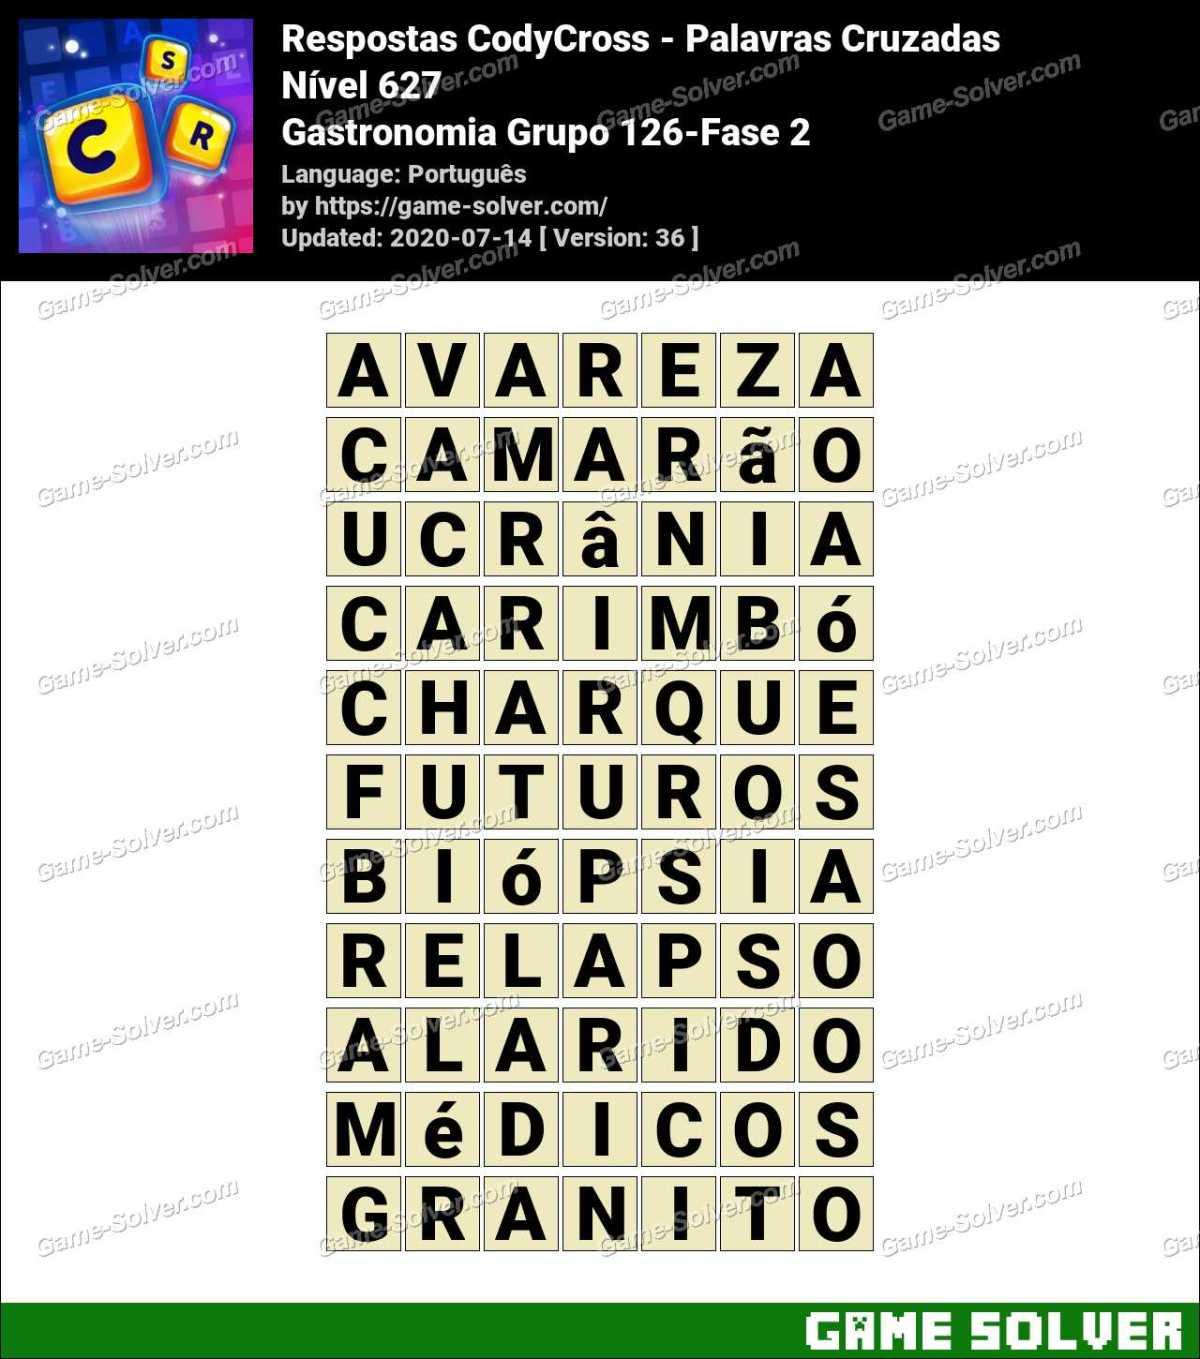 Respostas CodyCross Gastronomia Grupo 126-Fase 2